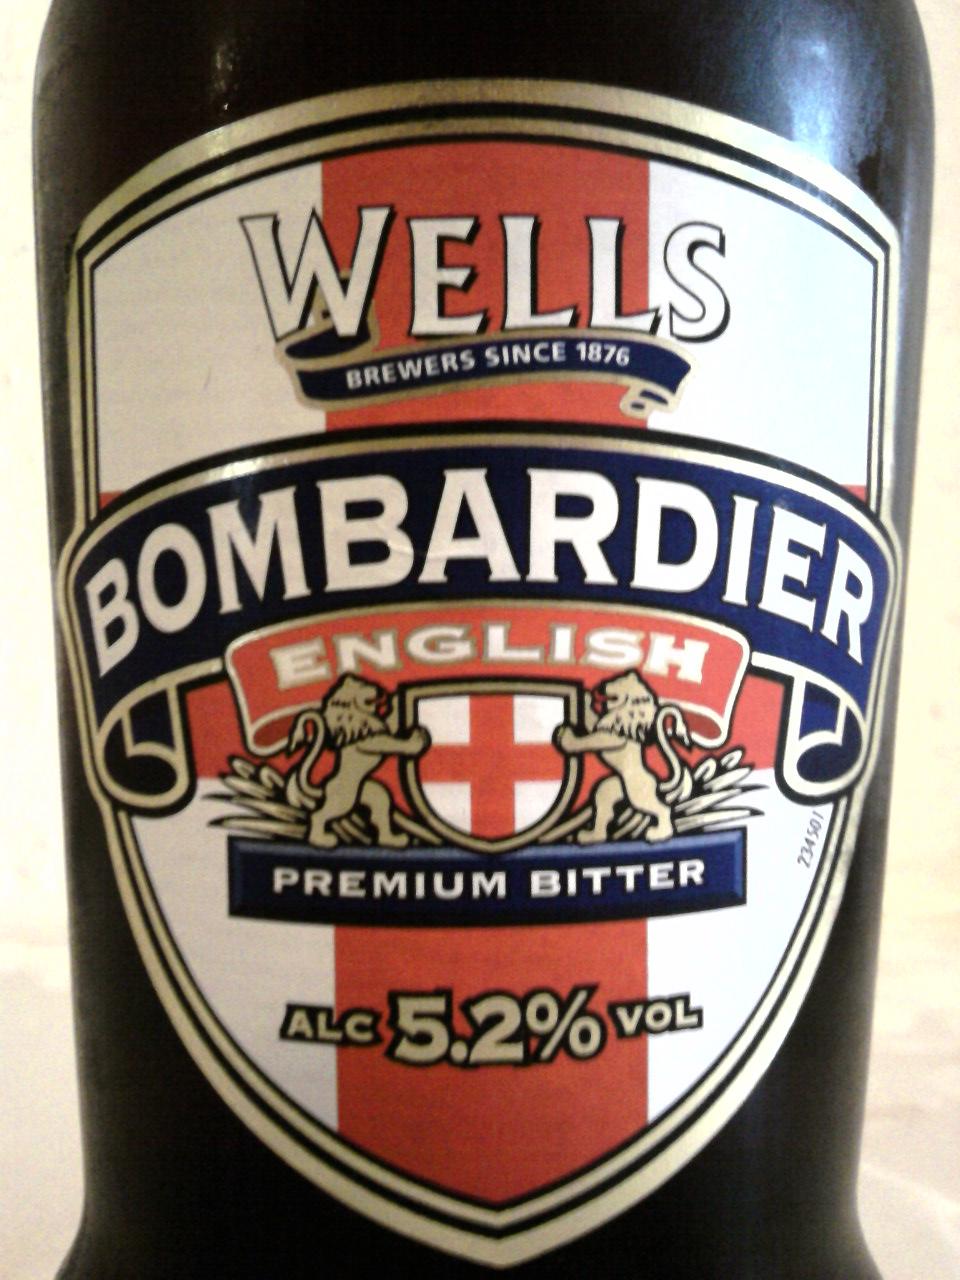 Wells Bombardier English Premium Bitter front label